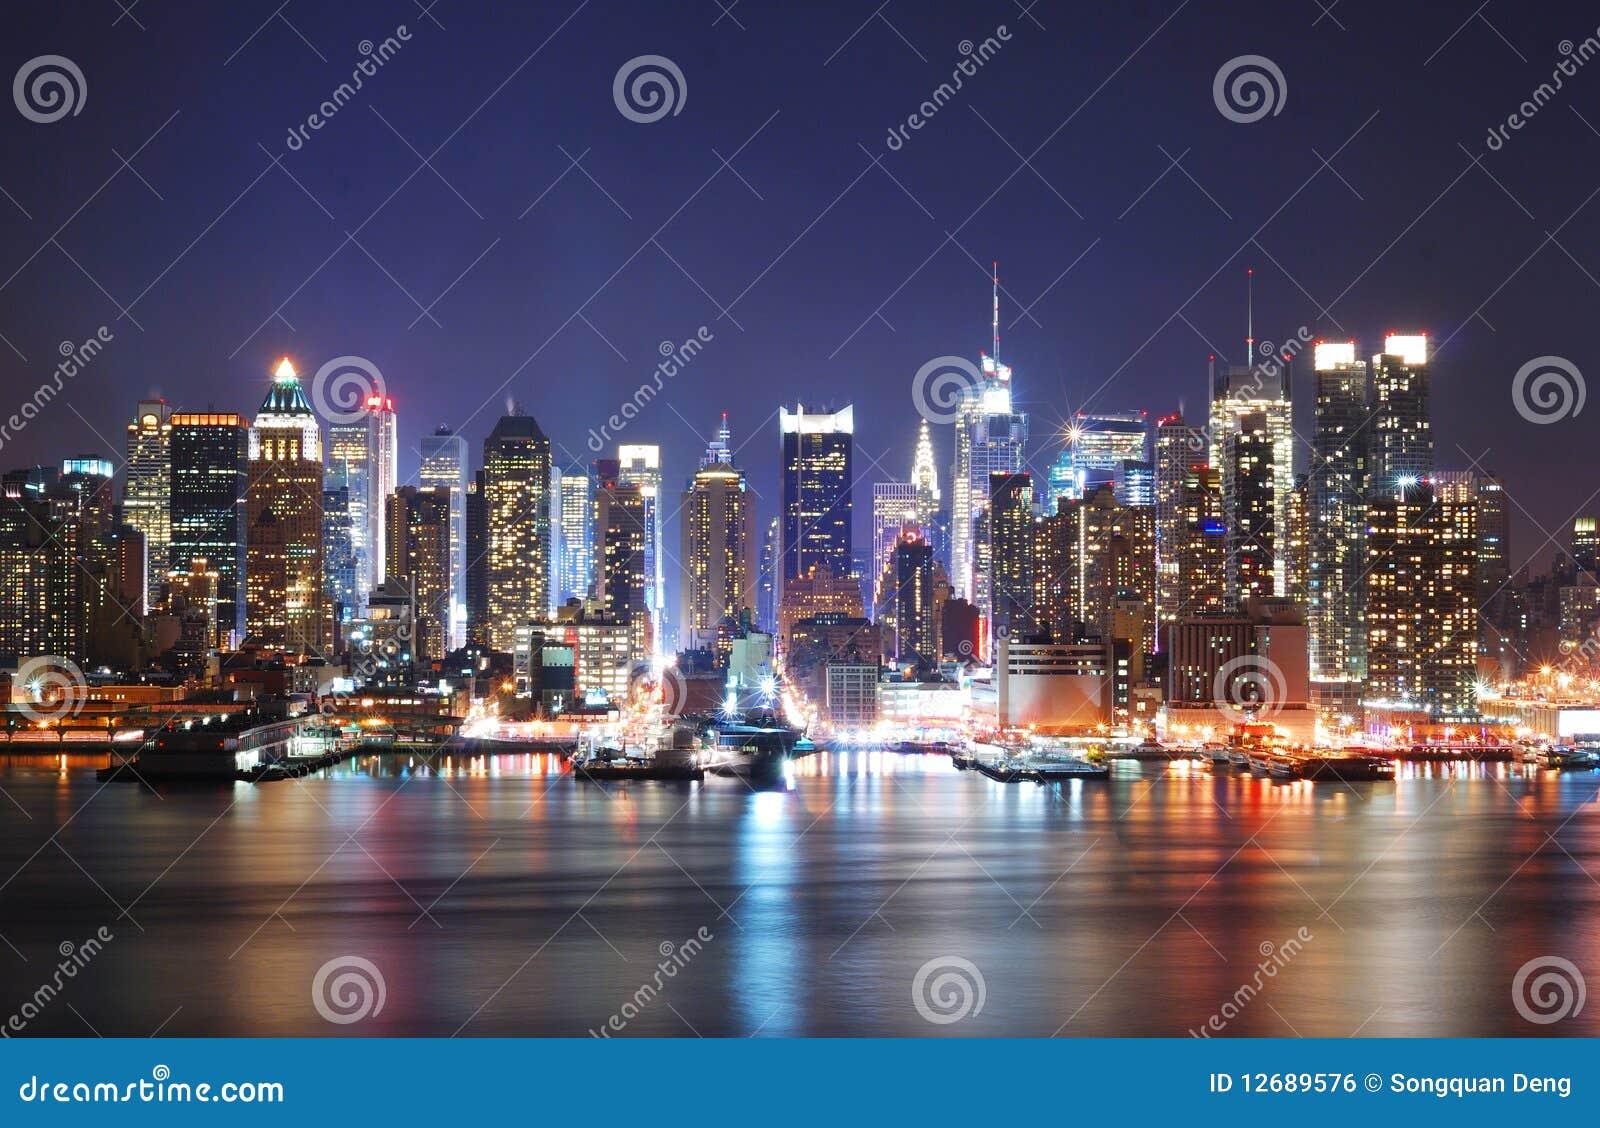 Mordern City night scene